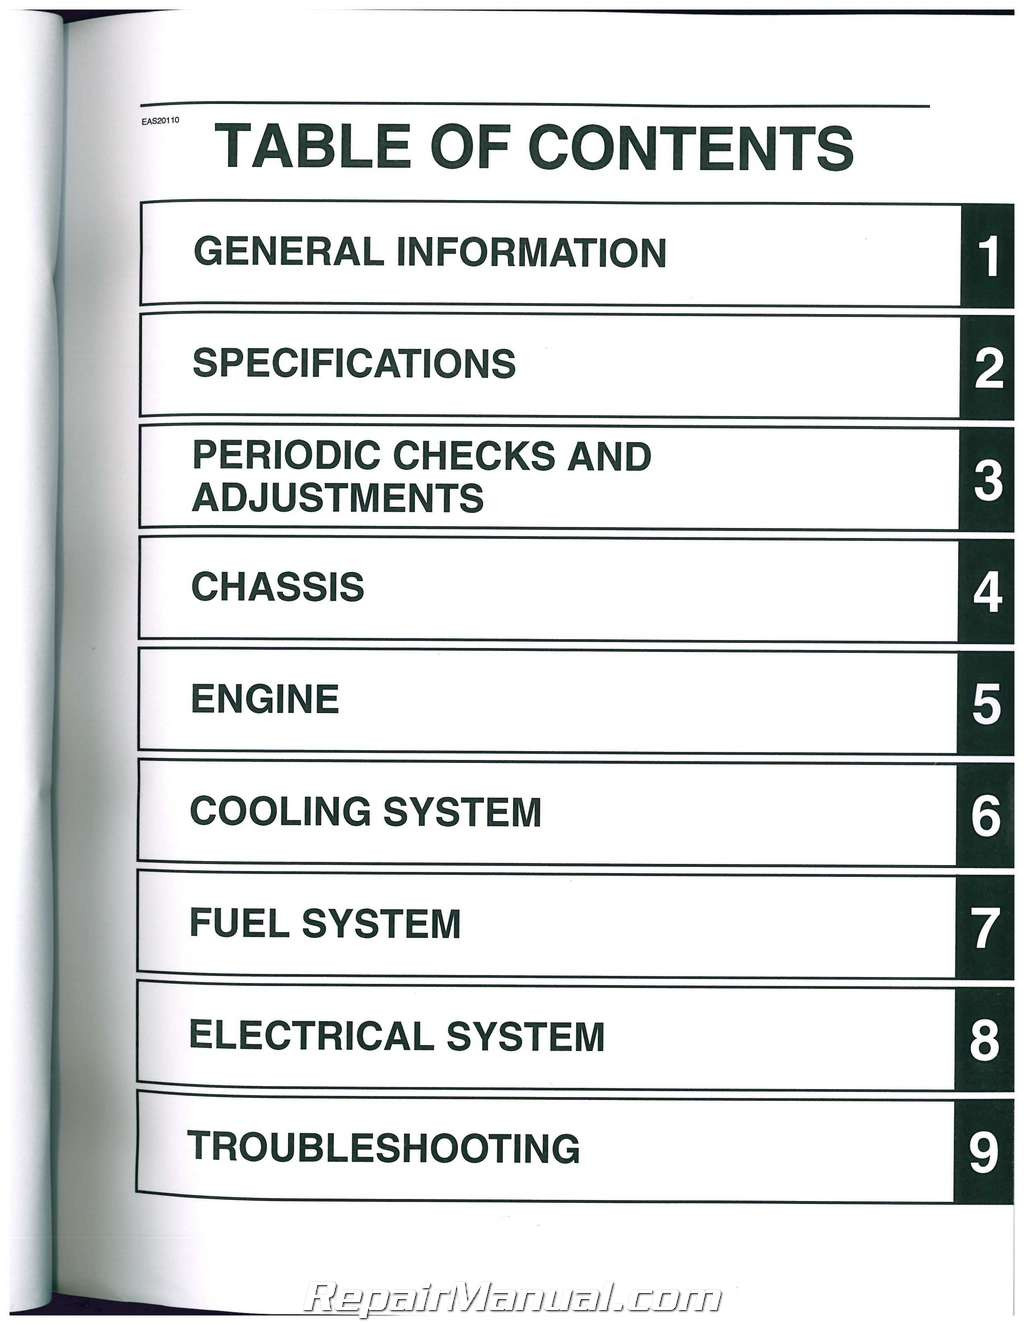 2009-2012 yamaha fjr1300 motorcycle service manual.